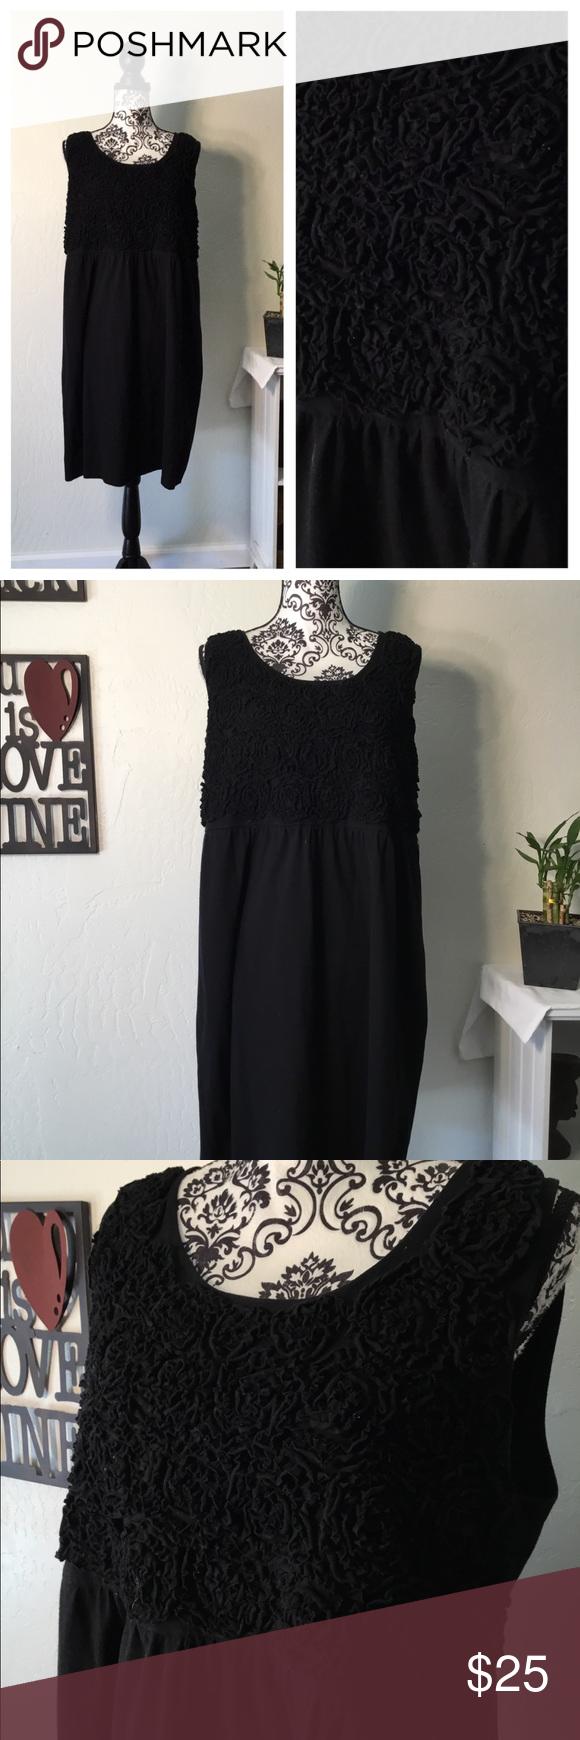 Apostrophe Black Dress Dresses Clothes Design Black Dress [ 1740 x 580 Pixel ]